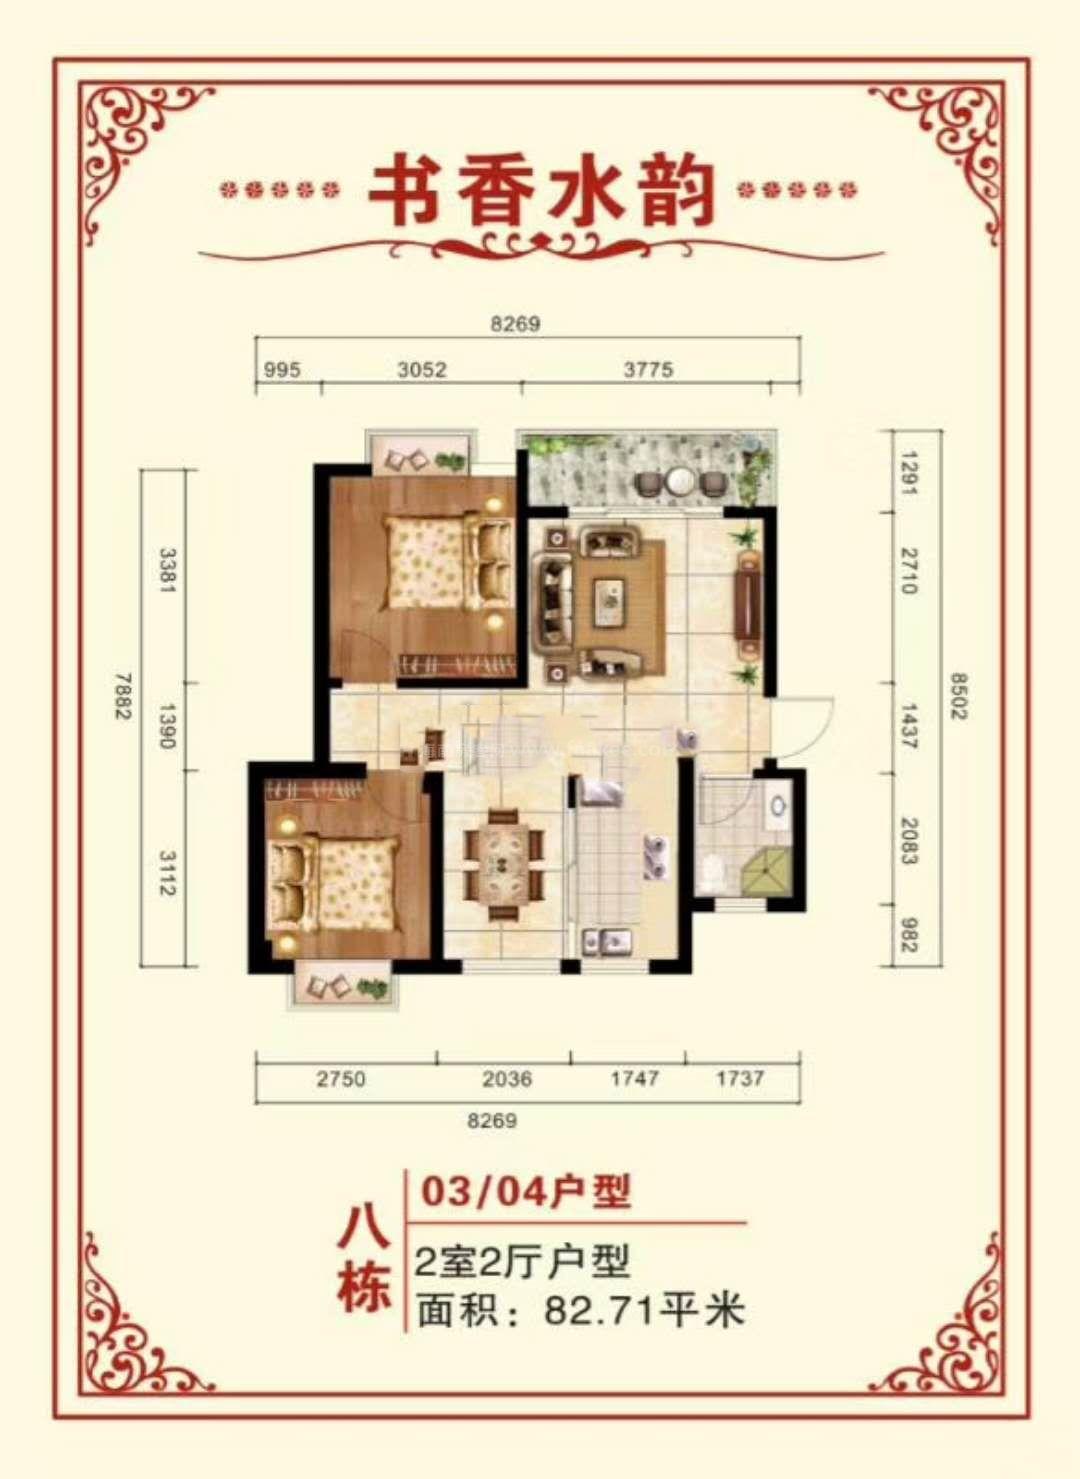 2室2厅1卫 建面82.71平